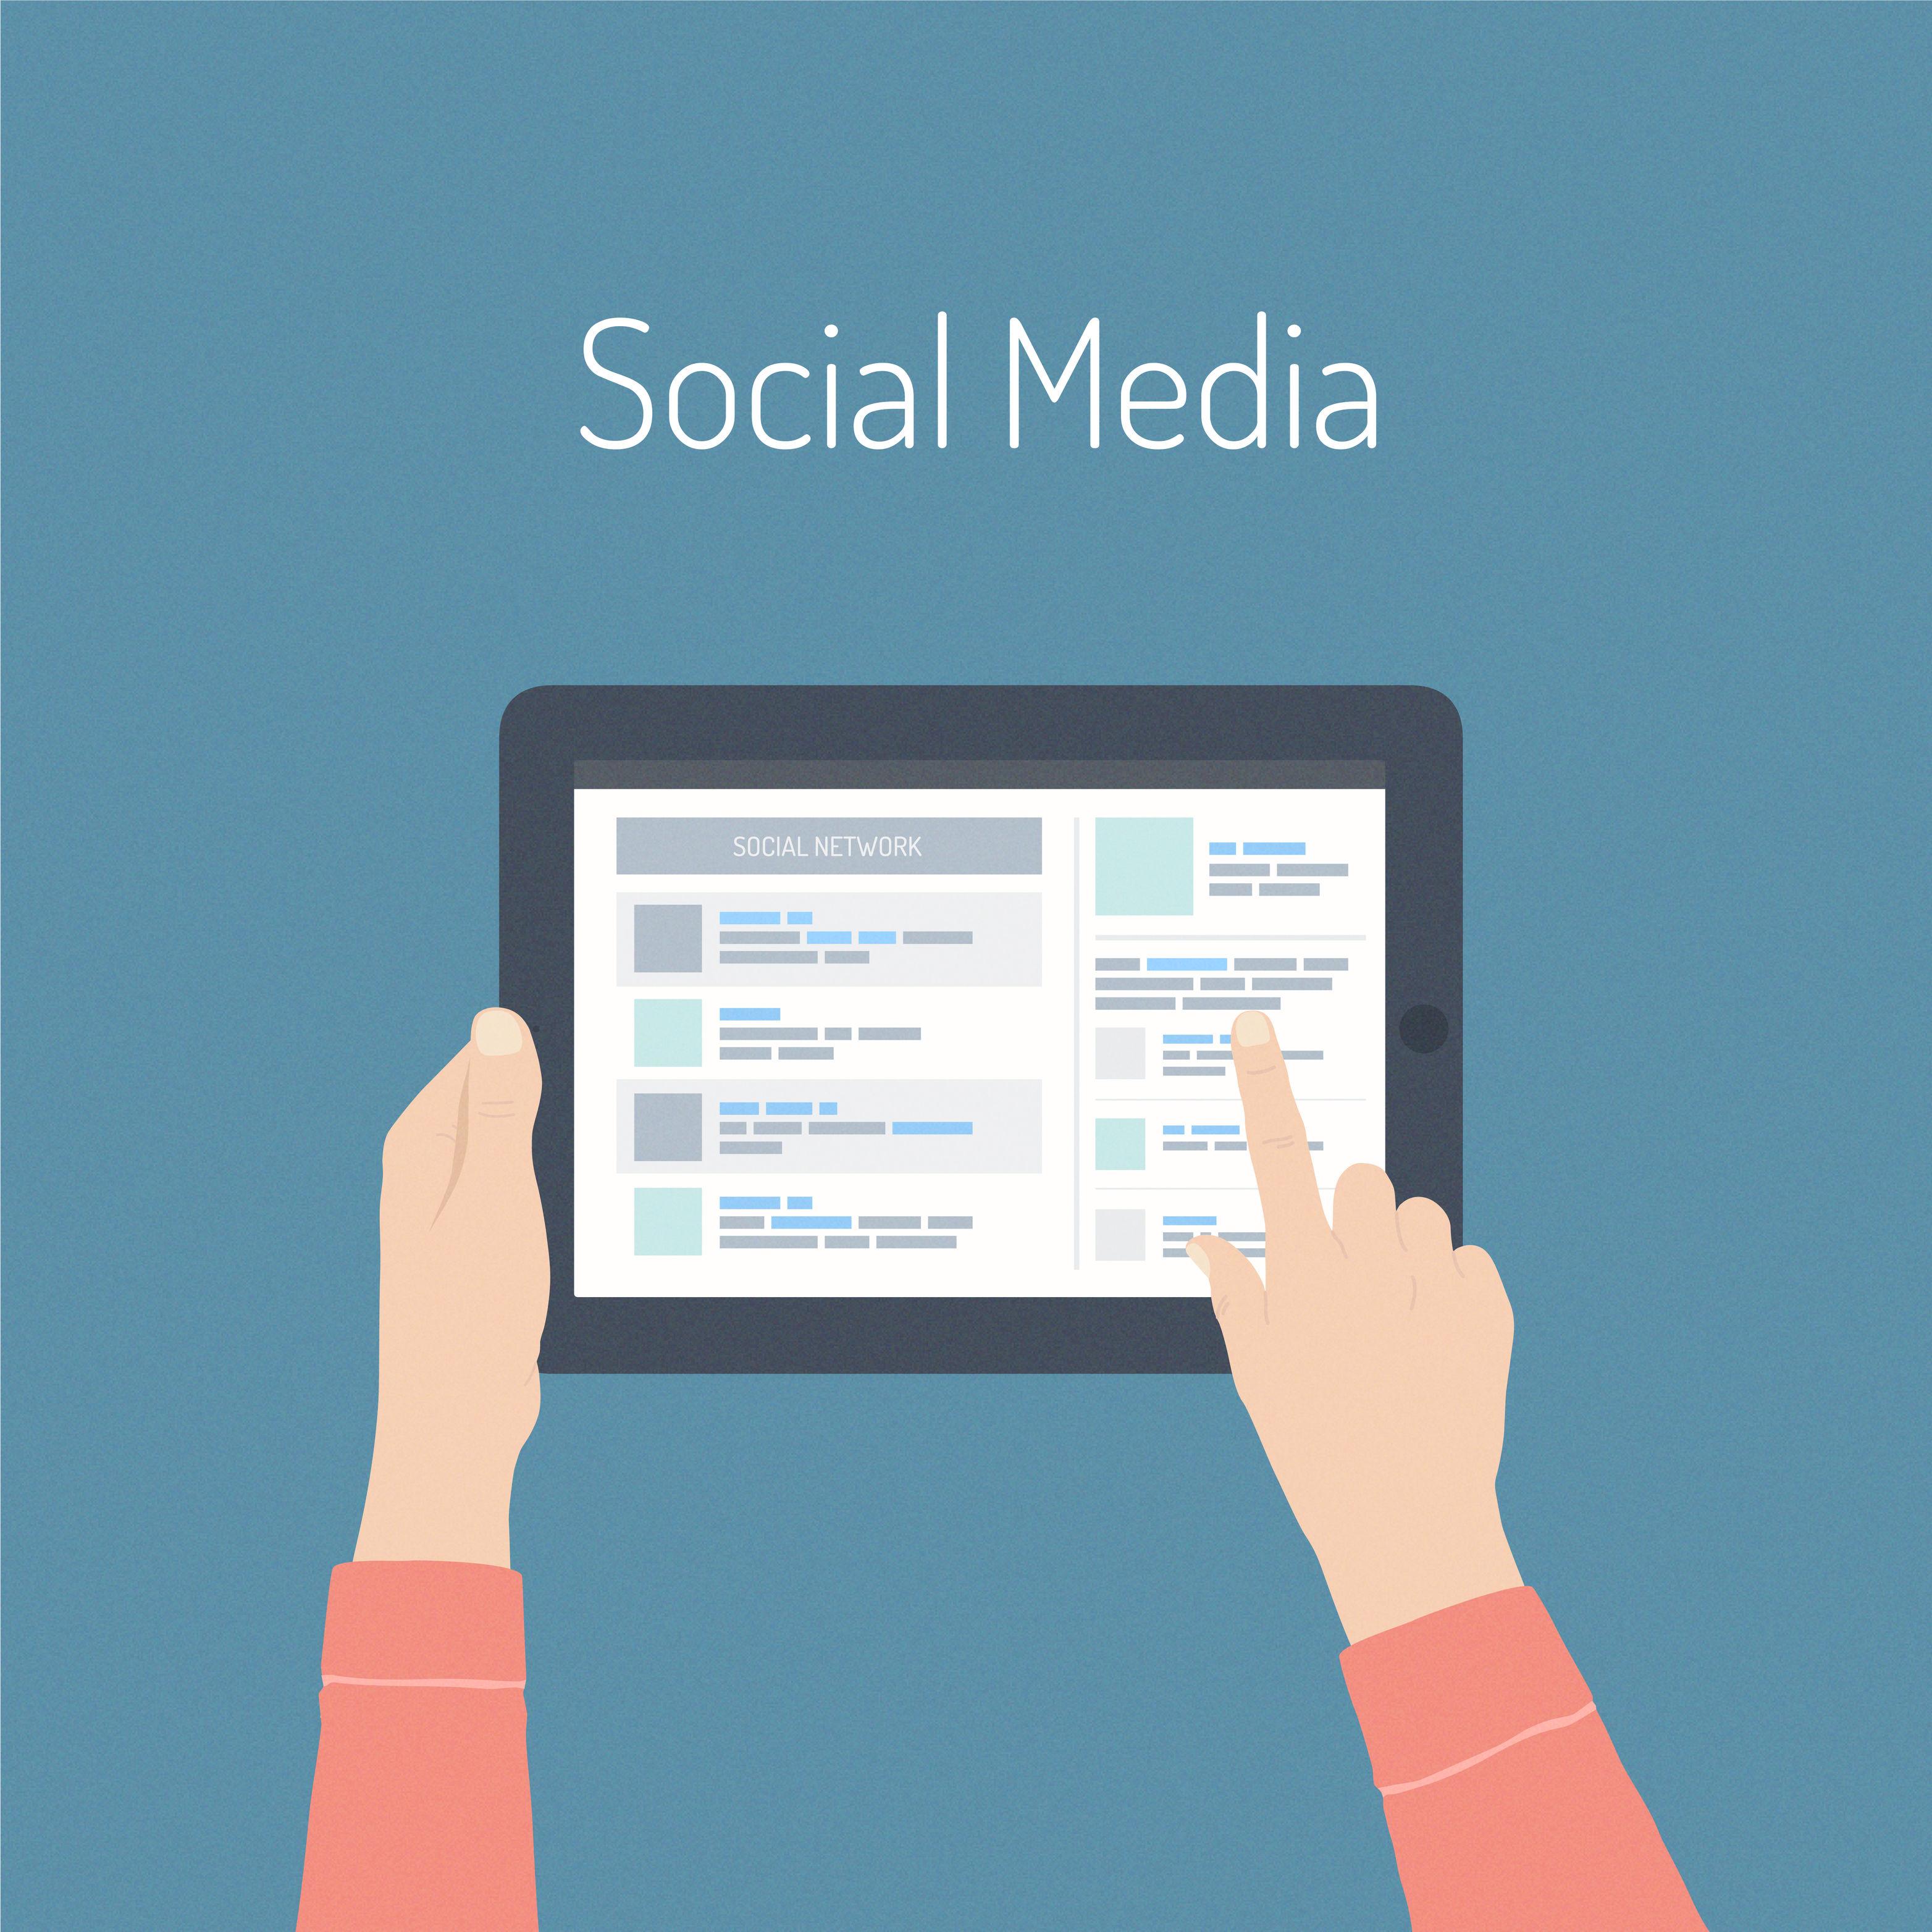 Sociale Medier Kragelund Kommunikation